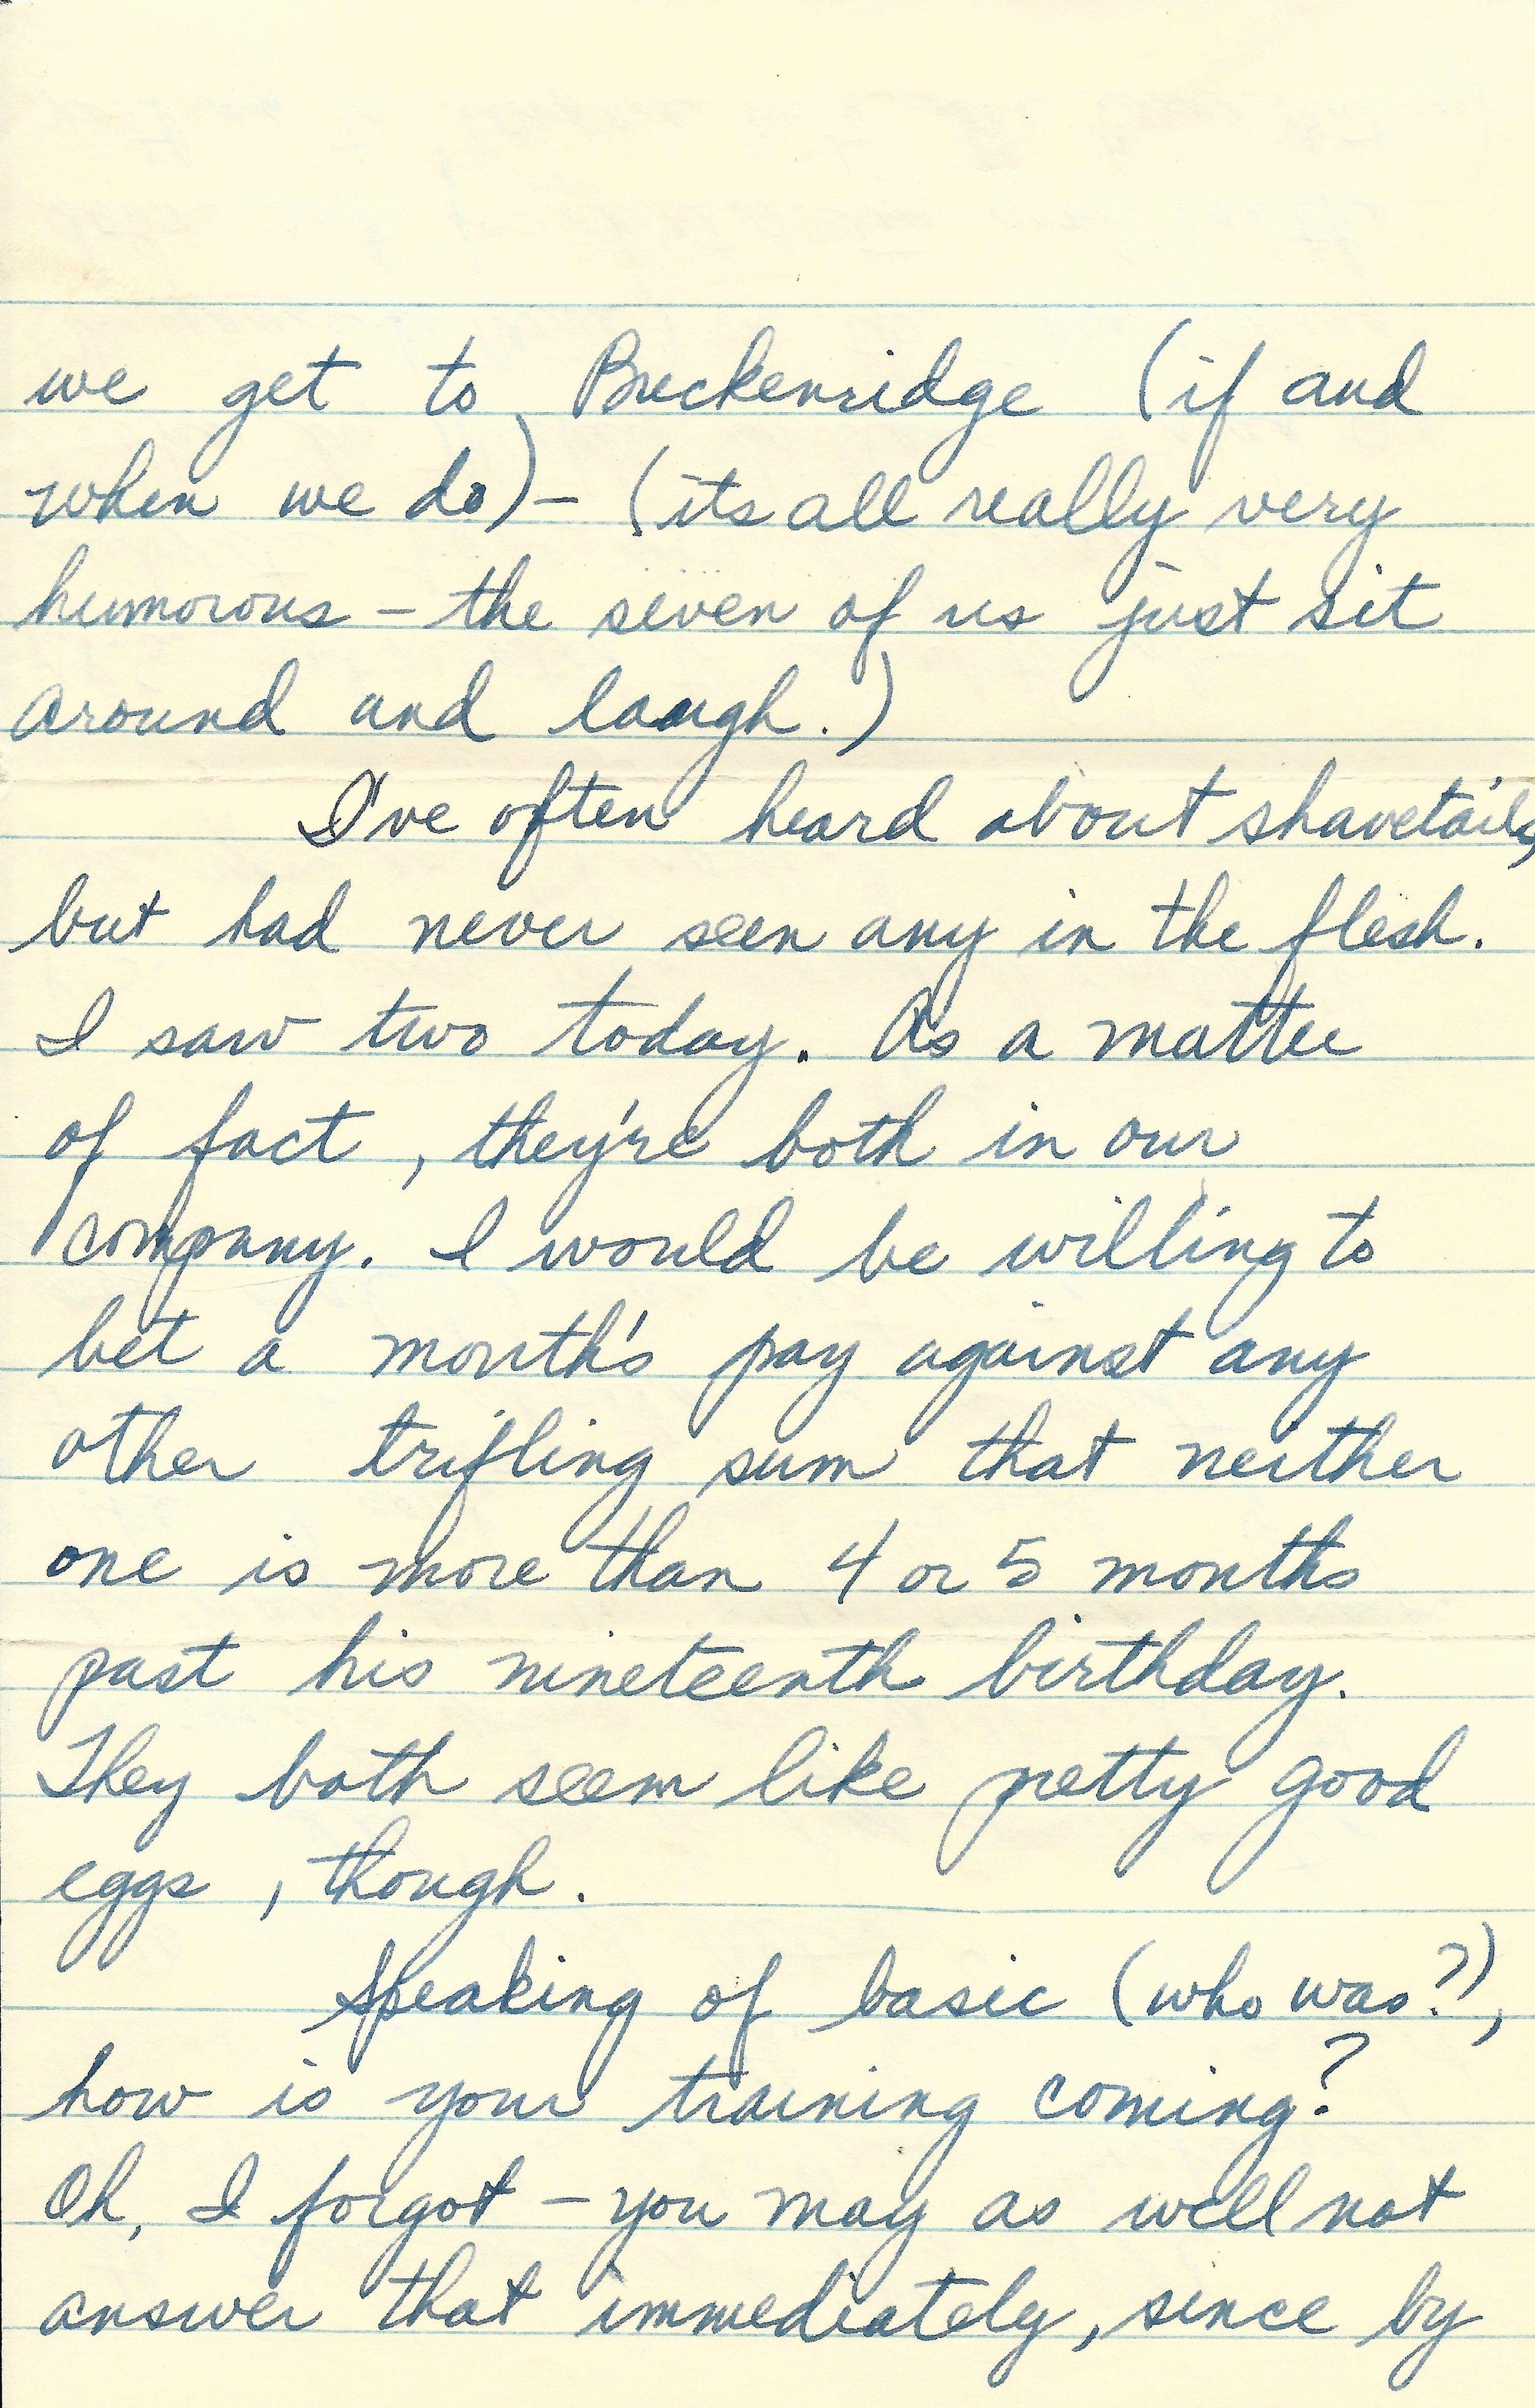 4. Oct. 10, 1952 (Opa)_Page_4.jpg